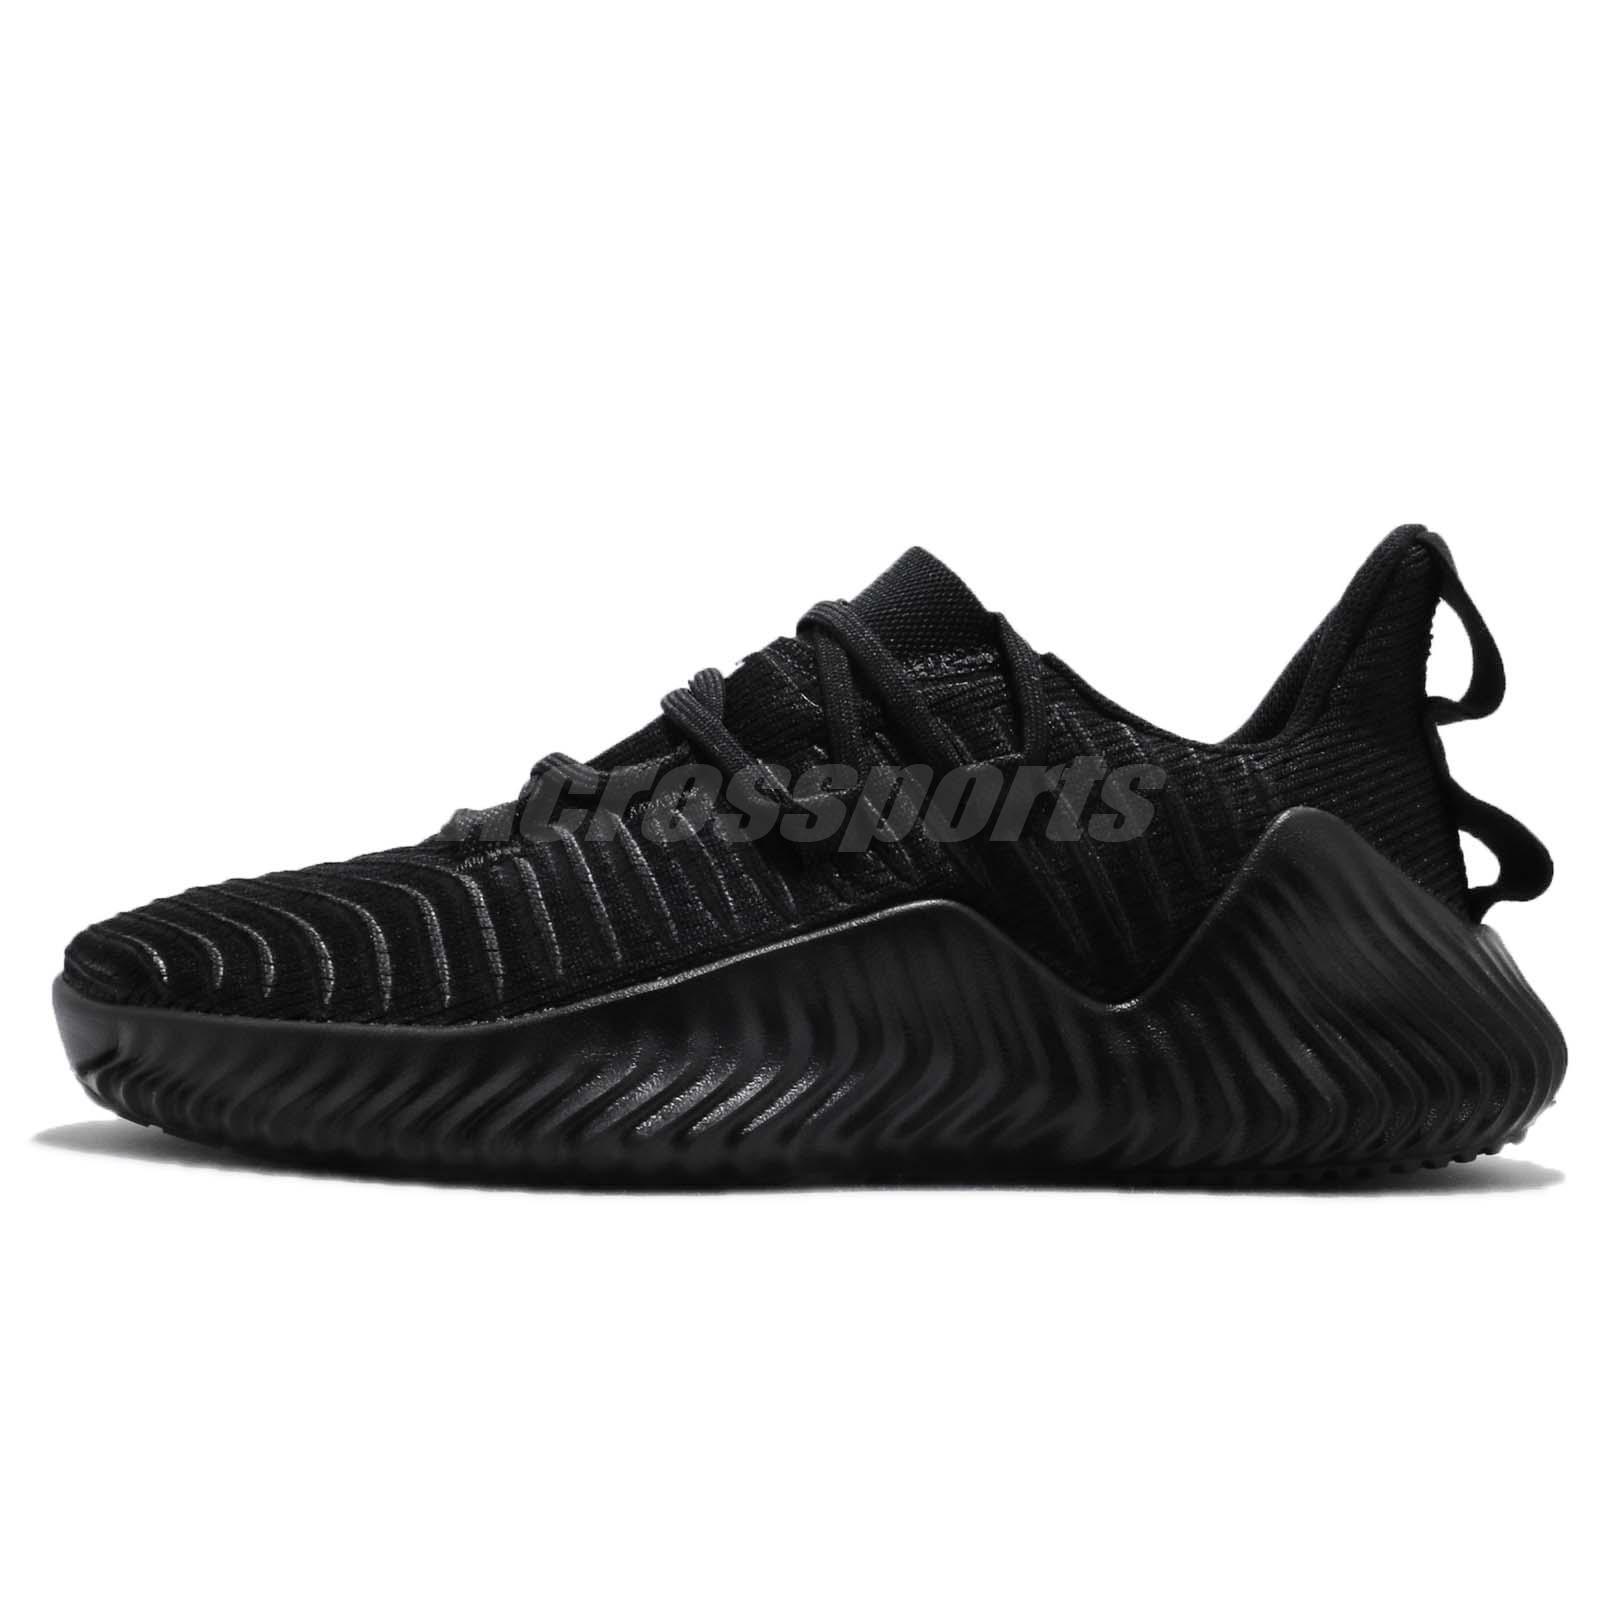 2a3da1becfe57 adidas Alphabounce Trainer Black Silver Men Cross Training Shoes Sneakers  AQ0609